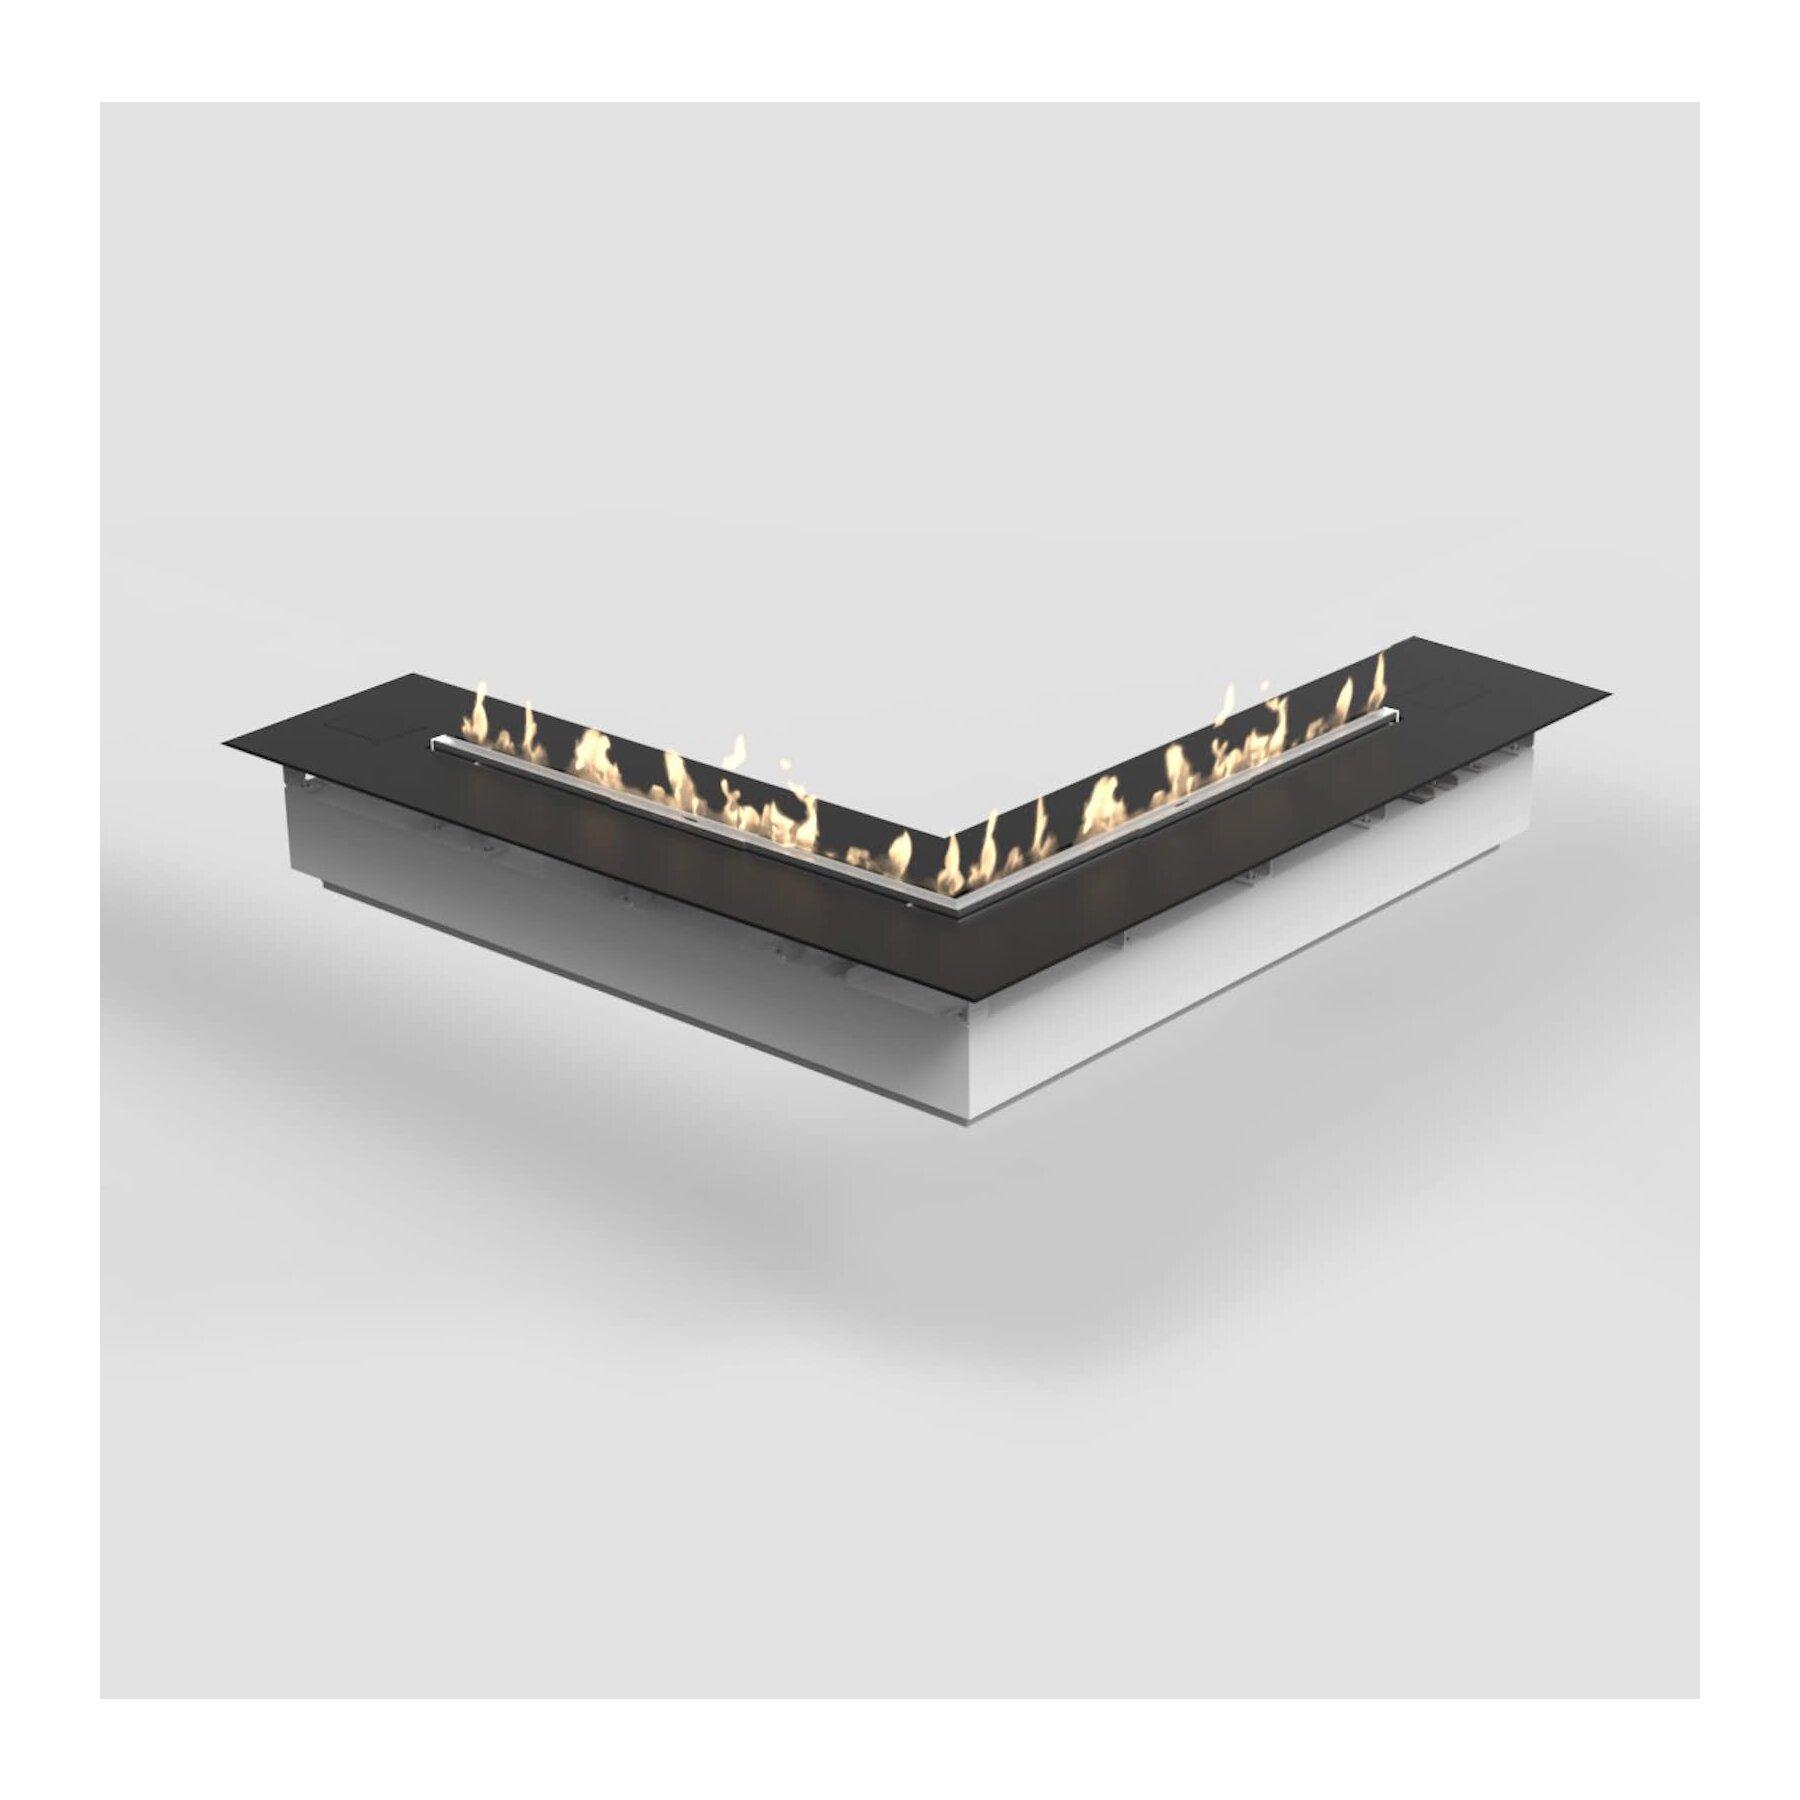 automatischer ethanolbrenner in sonderformen. Black Bedroom Furniture Sets. Home Design Ideas